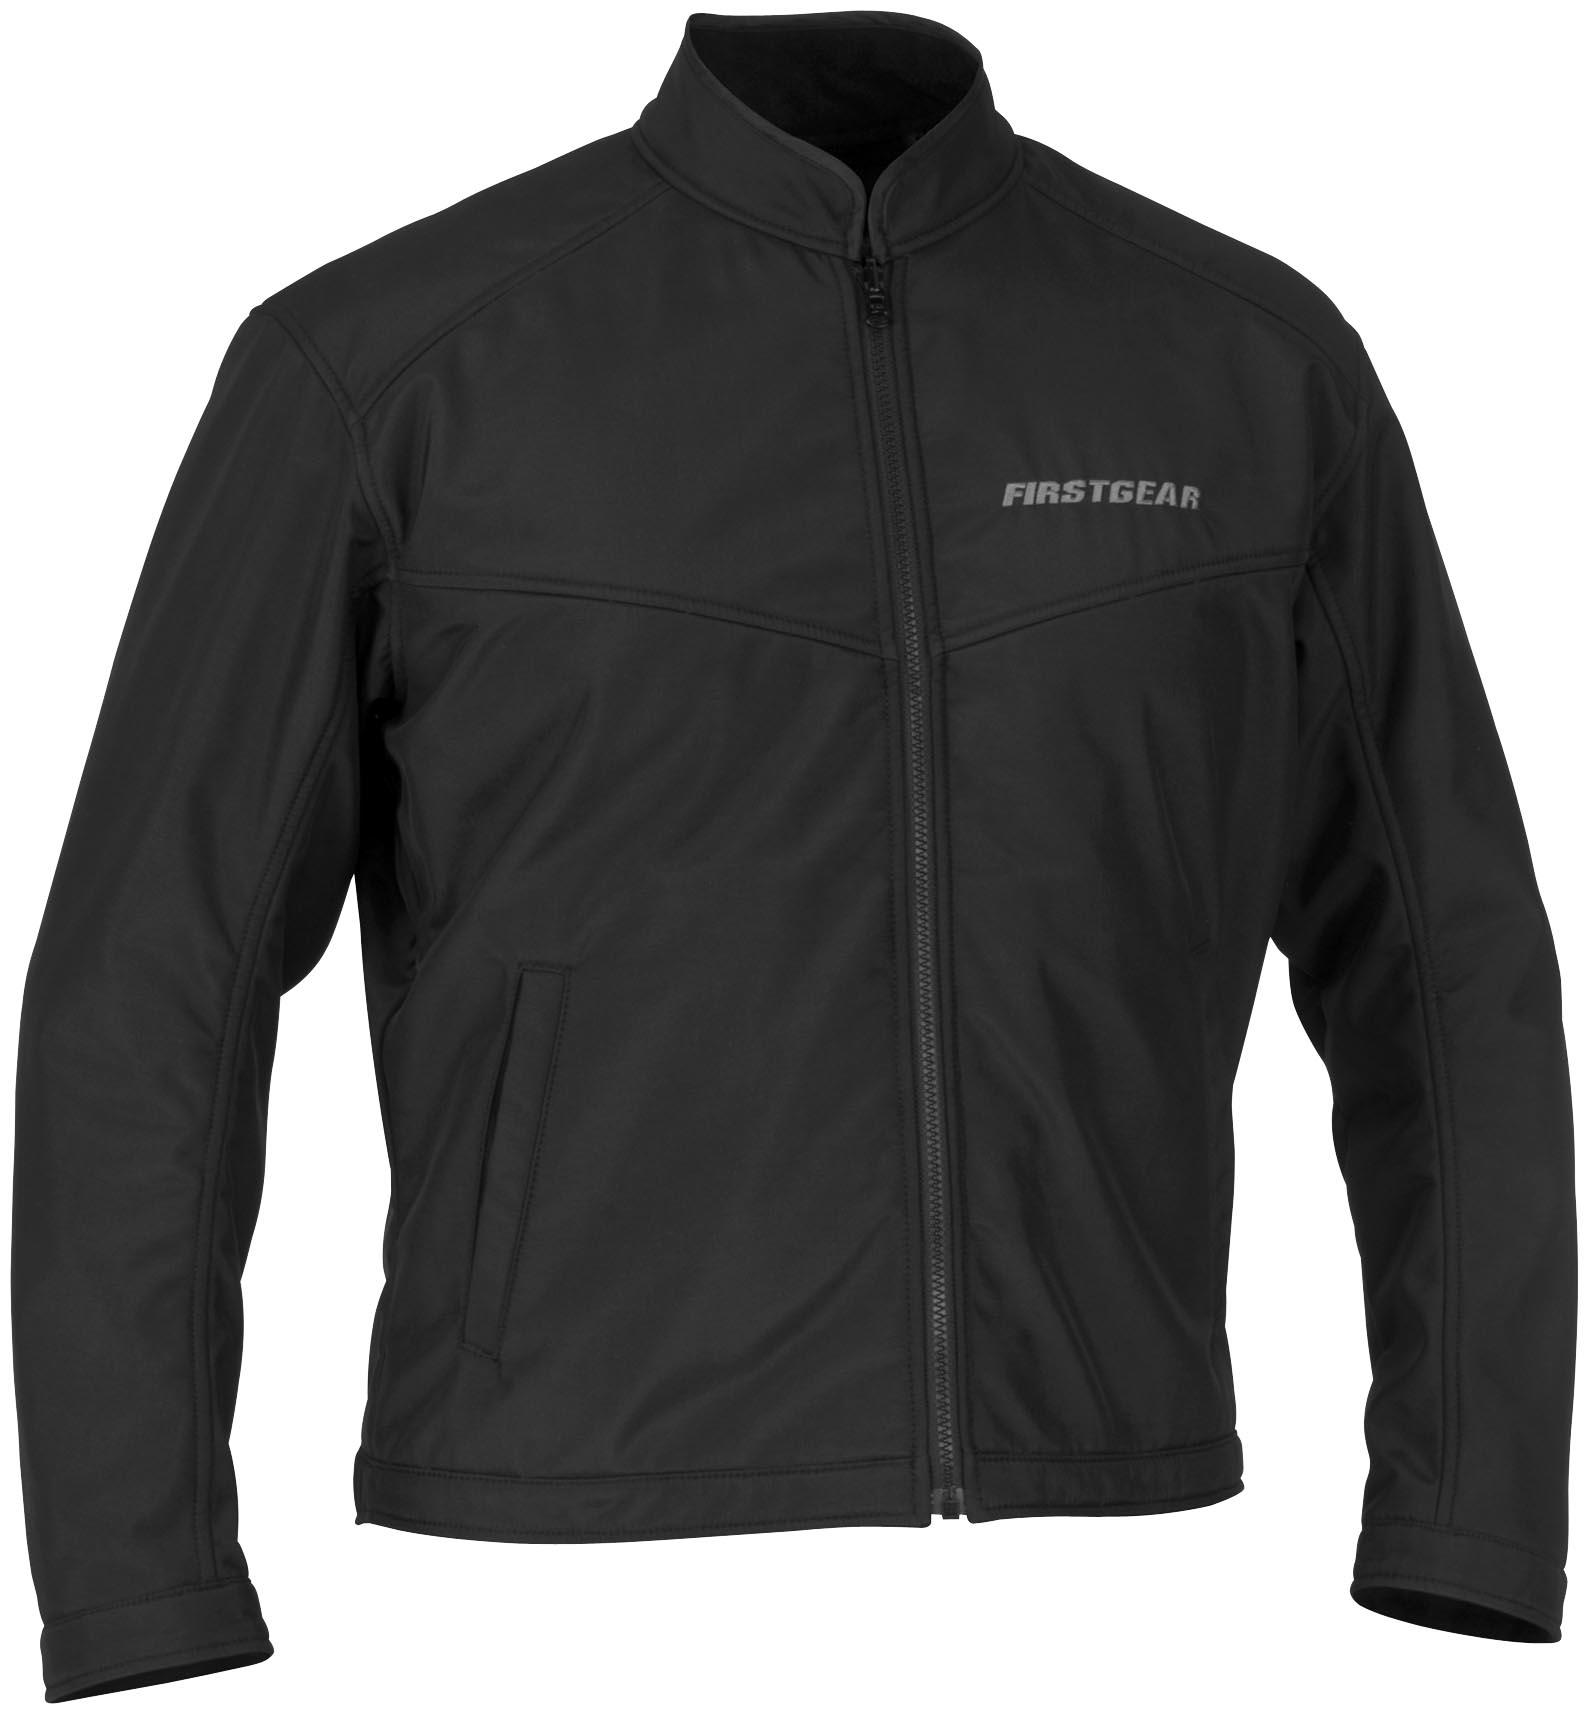 Firstgear Softshell Liner Women's Jacket